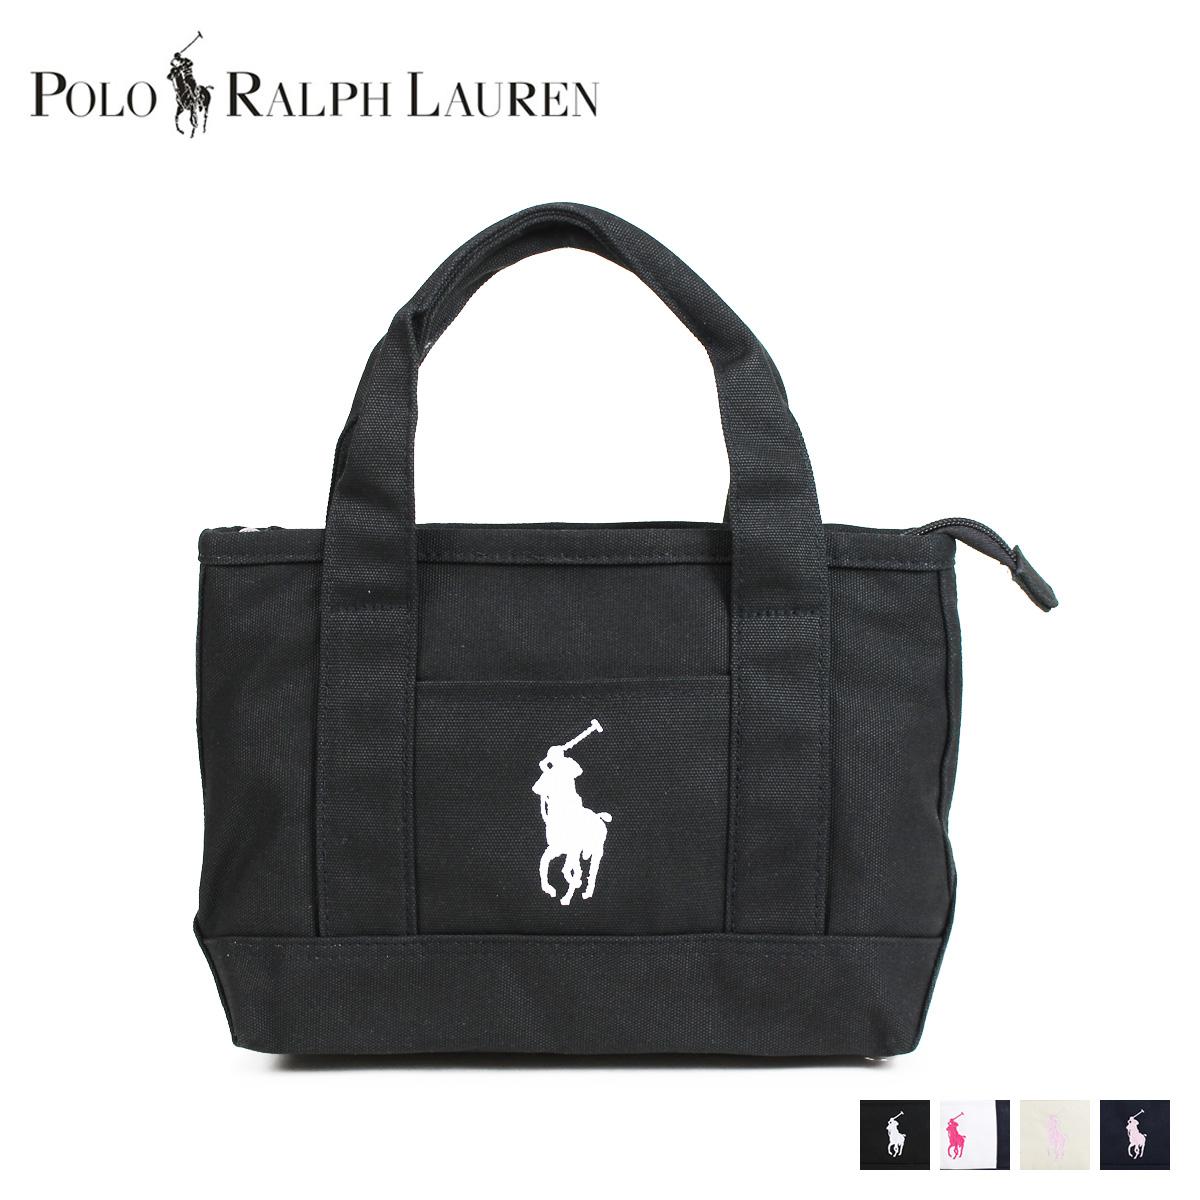 Men Canvas White Ralph 86 Polo Navythe Dis Additional Lauren Bag Small Black Arrival Tote Gap vbfgIy7mY6